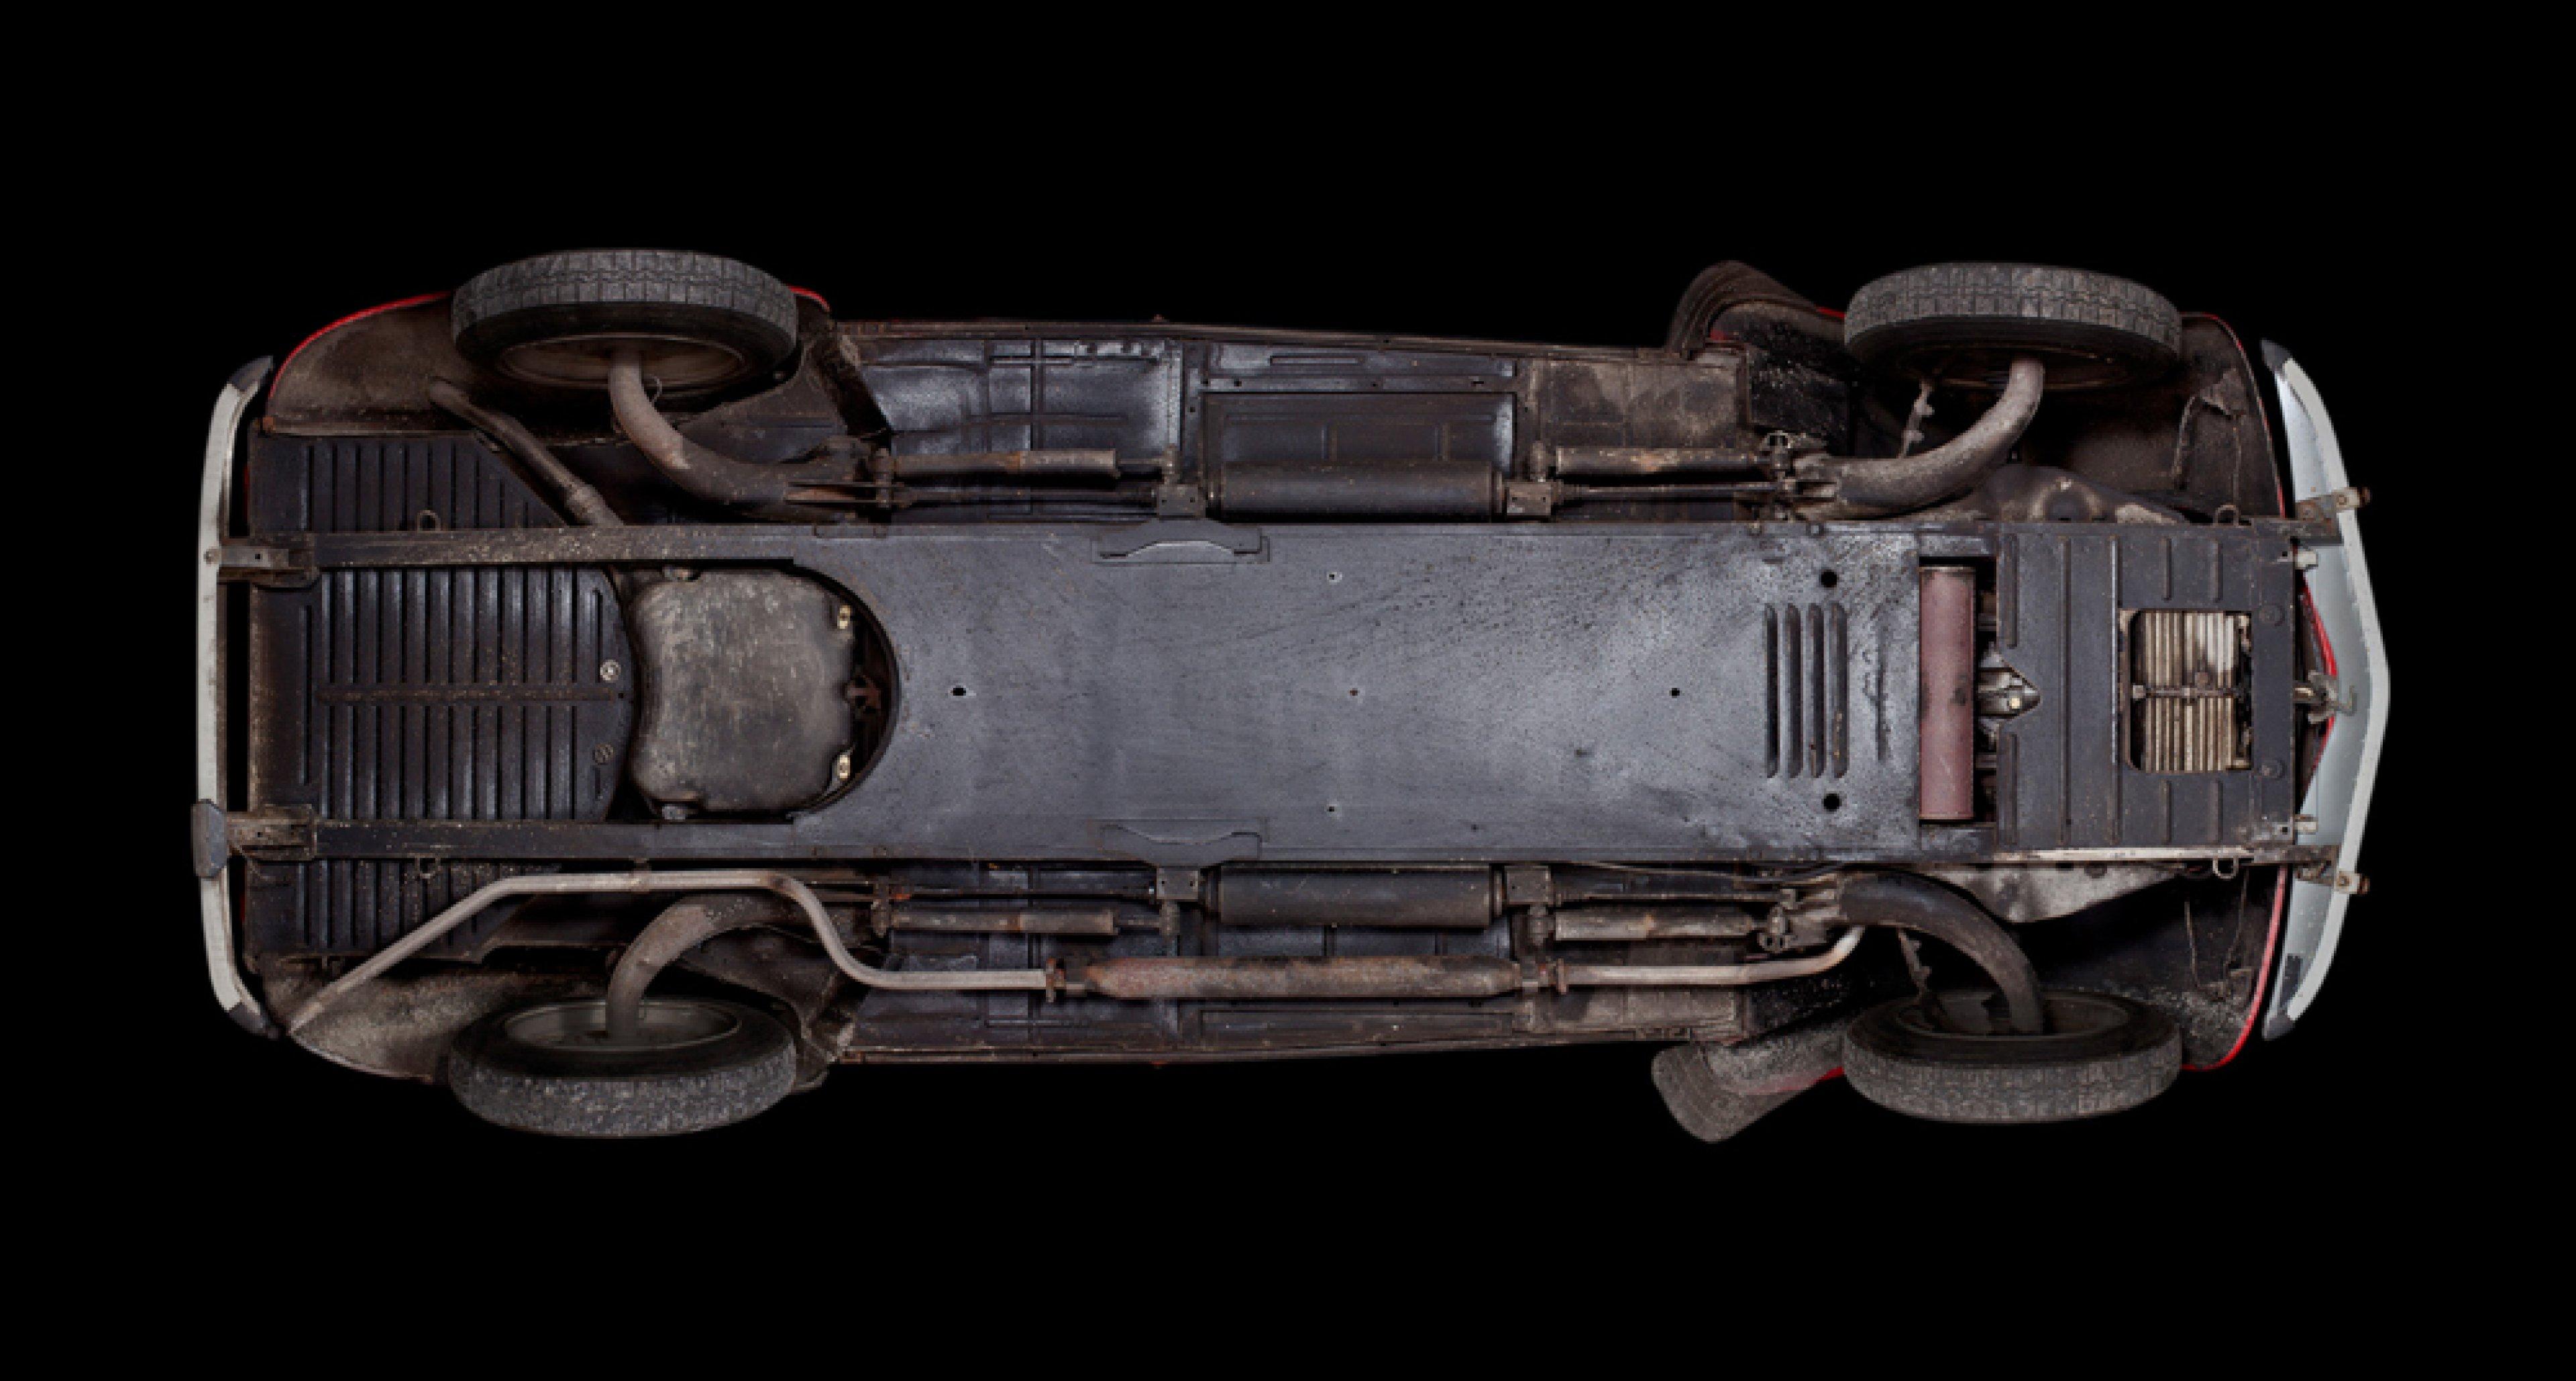 A 1968 Citroen 2CV 6.